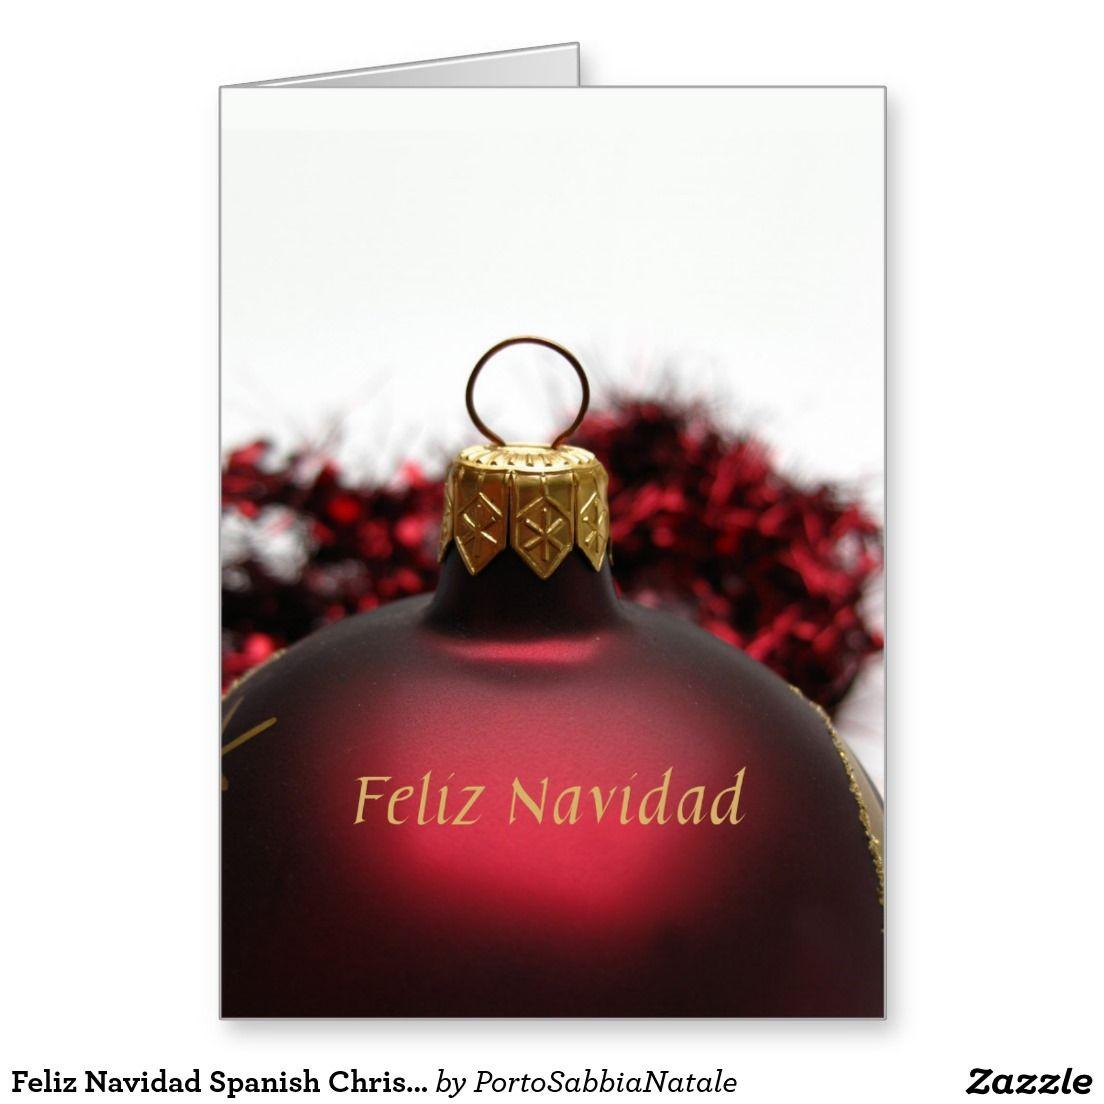 Feliz navidad spanish christmas card all things zazzle feliz navidad spanish christmas card kristyandbryce Images